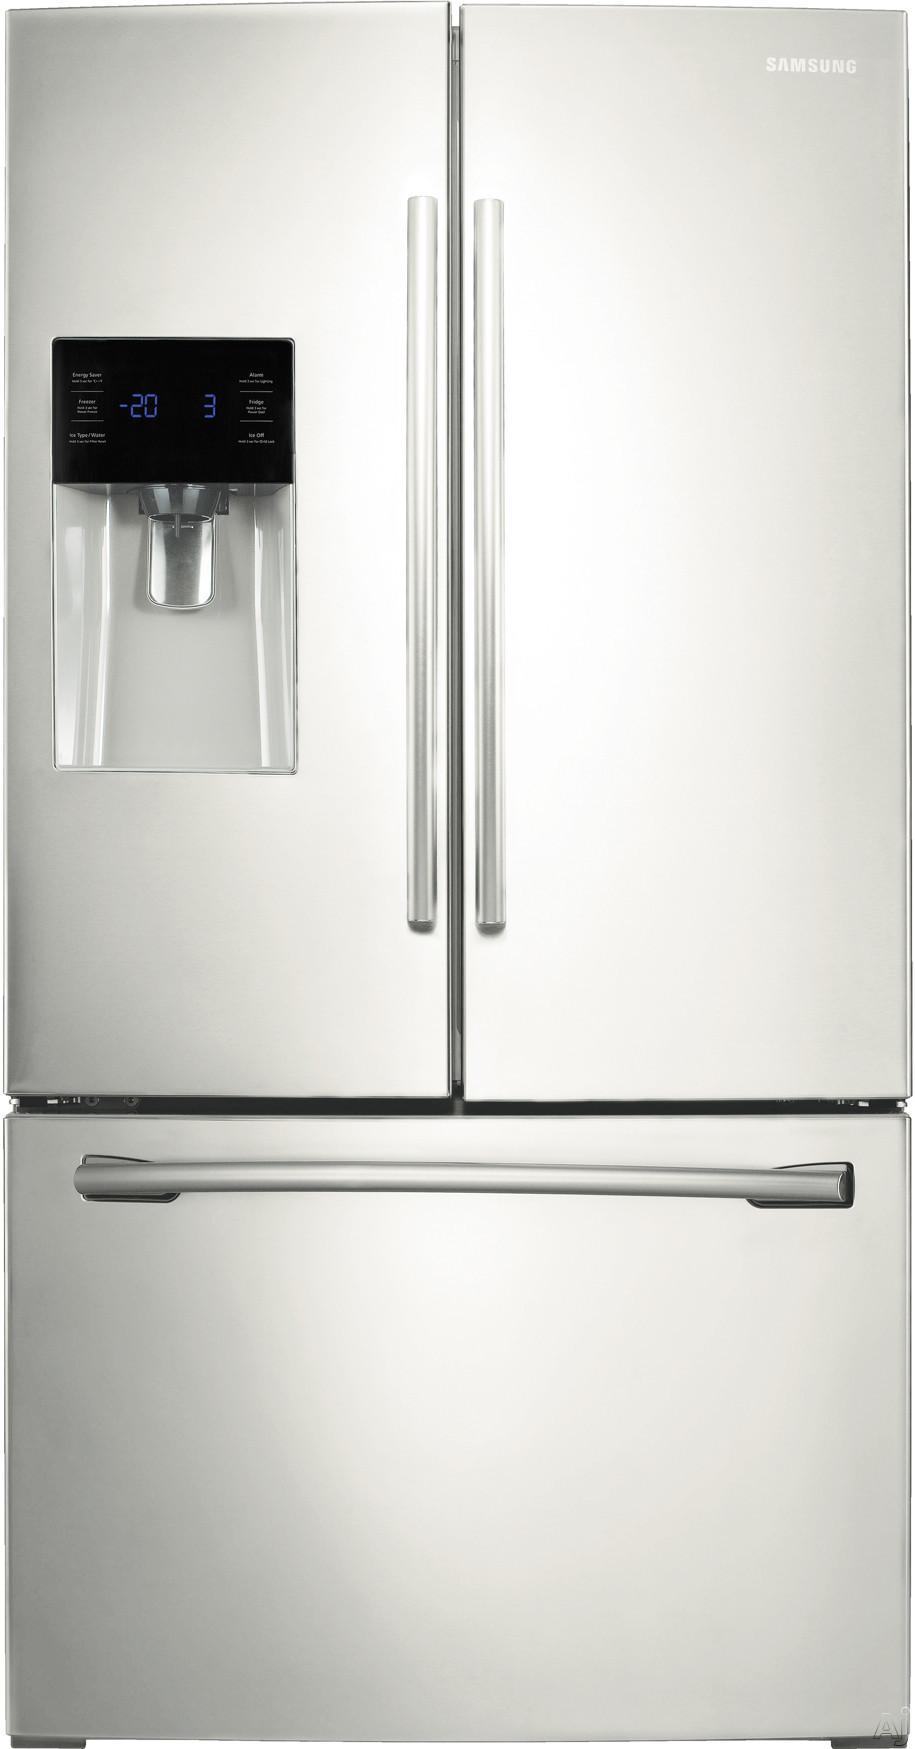 samsung rf263beaeww 24 6 cu ft french door refrigerator. Black Bedroom Furniture Sets. Home Design Ideas